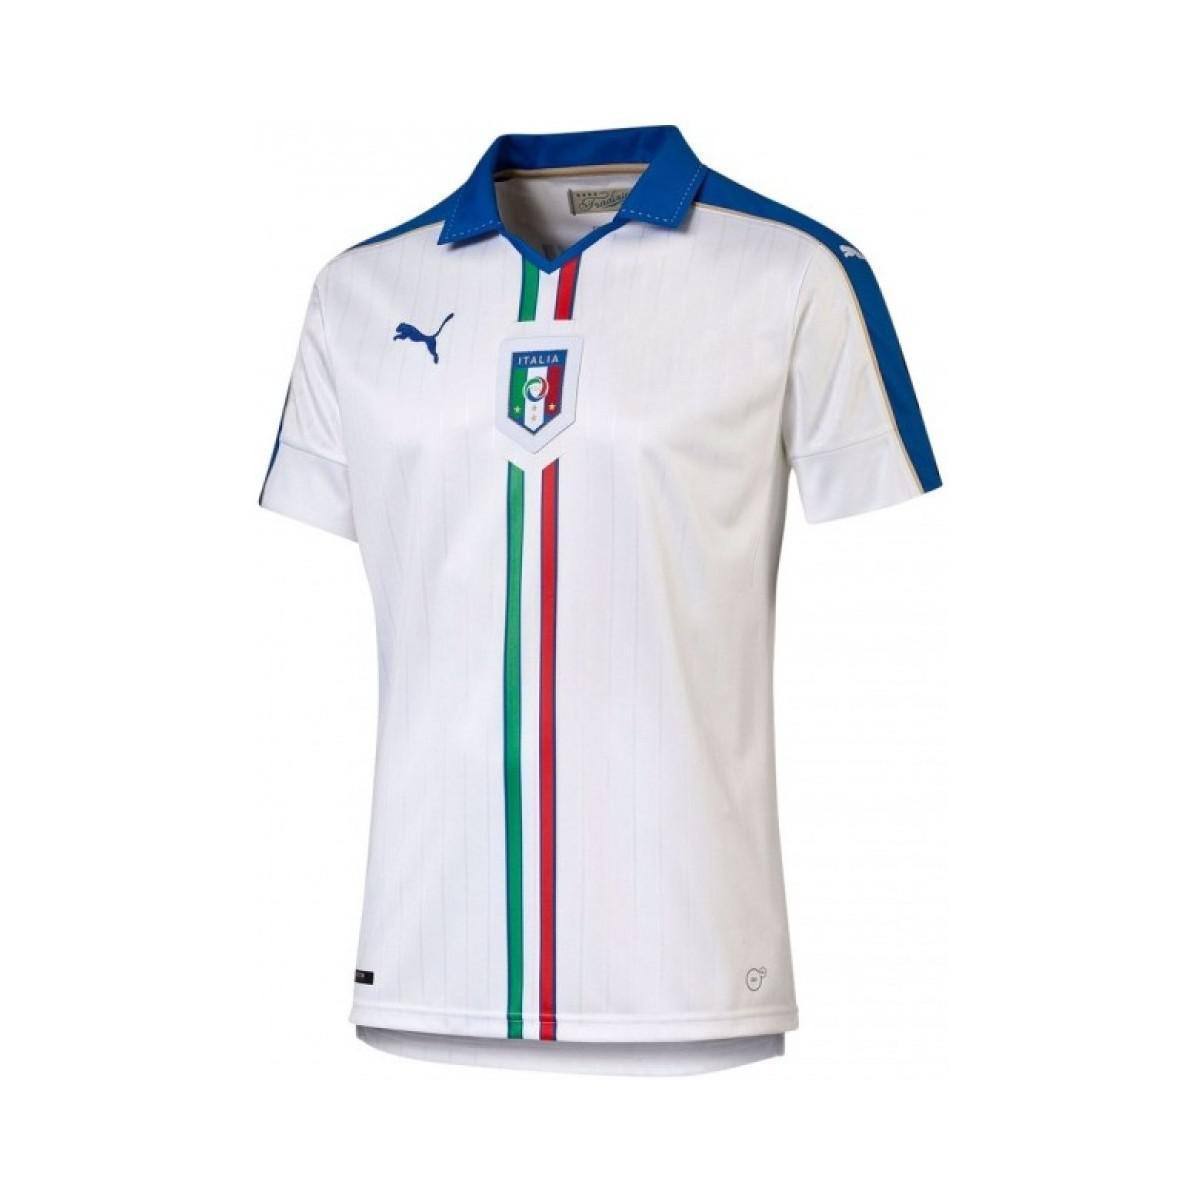 66a1b8217c Puma 2015-16 Italy Away Shirt (cannavaro 5) - Kids Men s T Shirt In ...